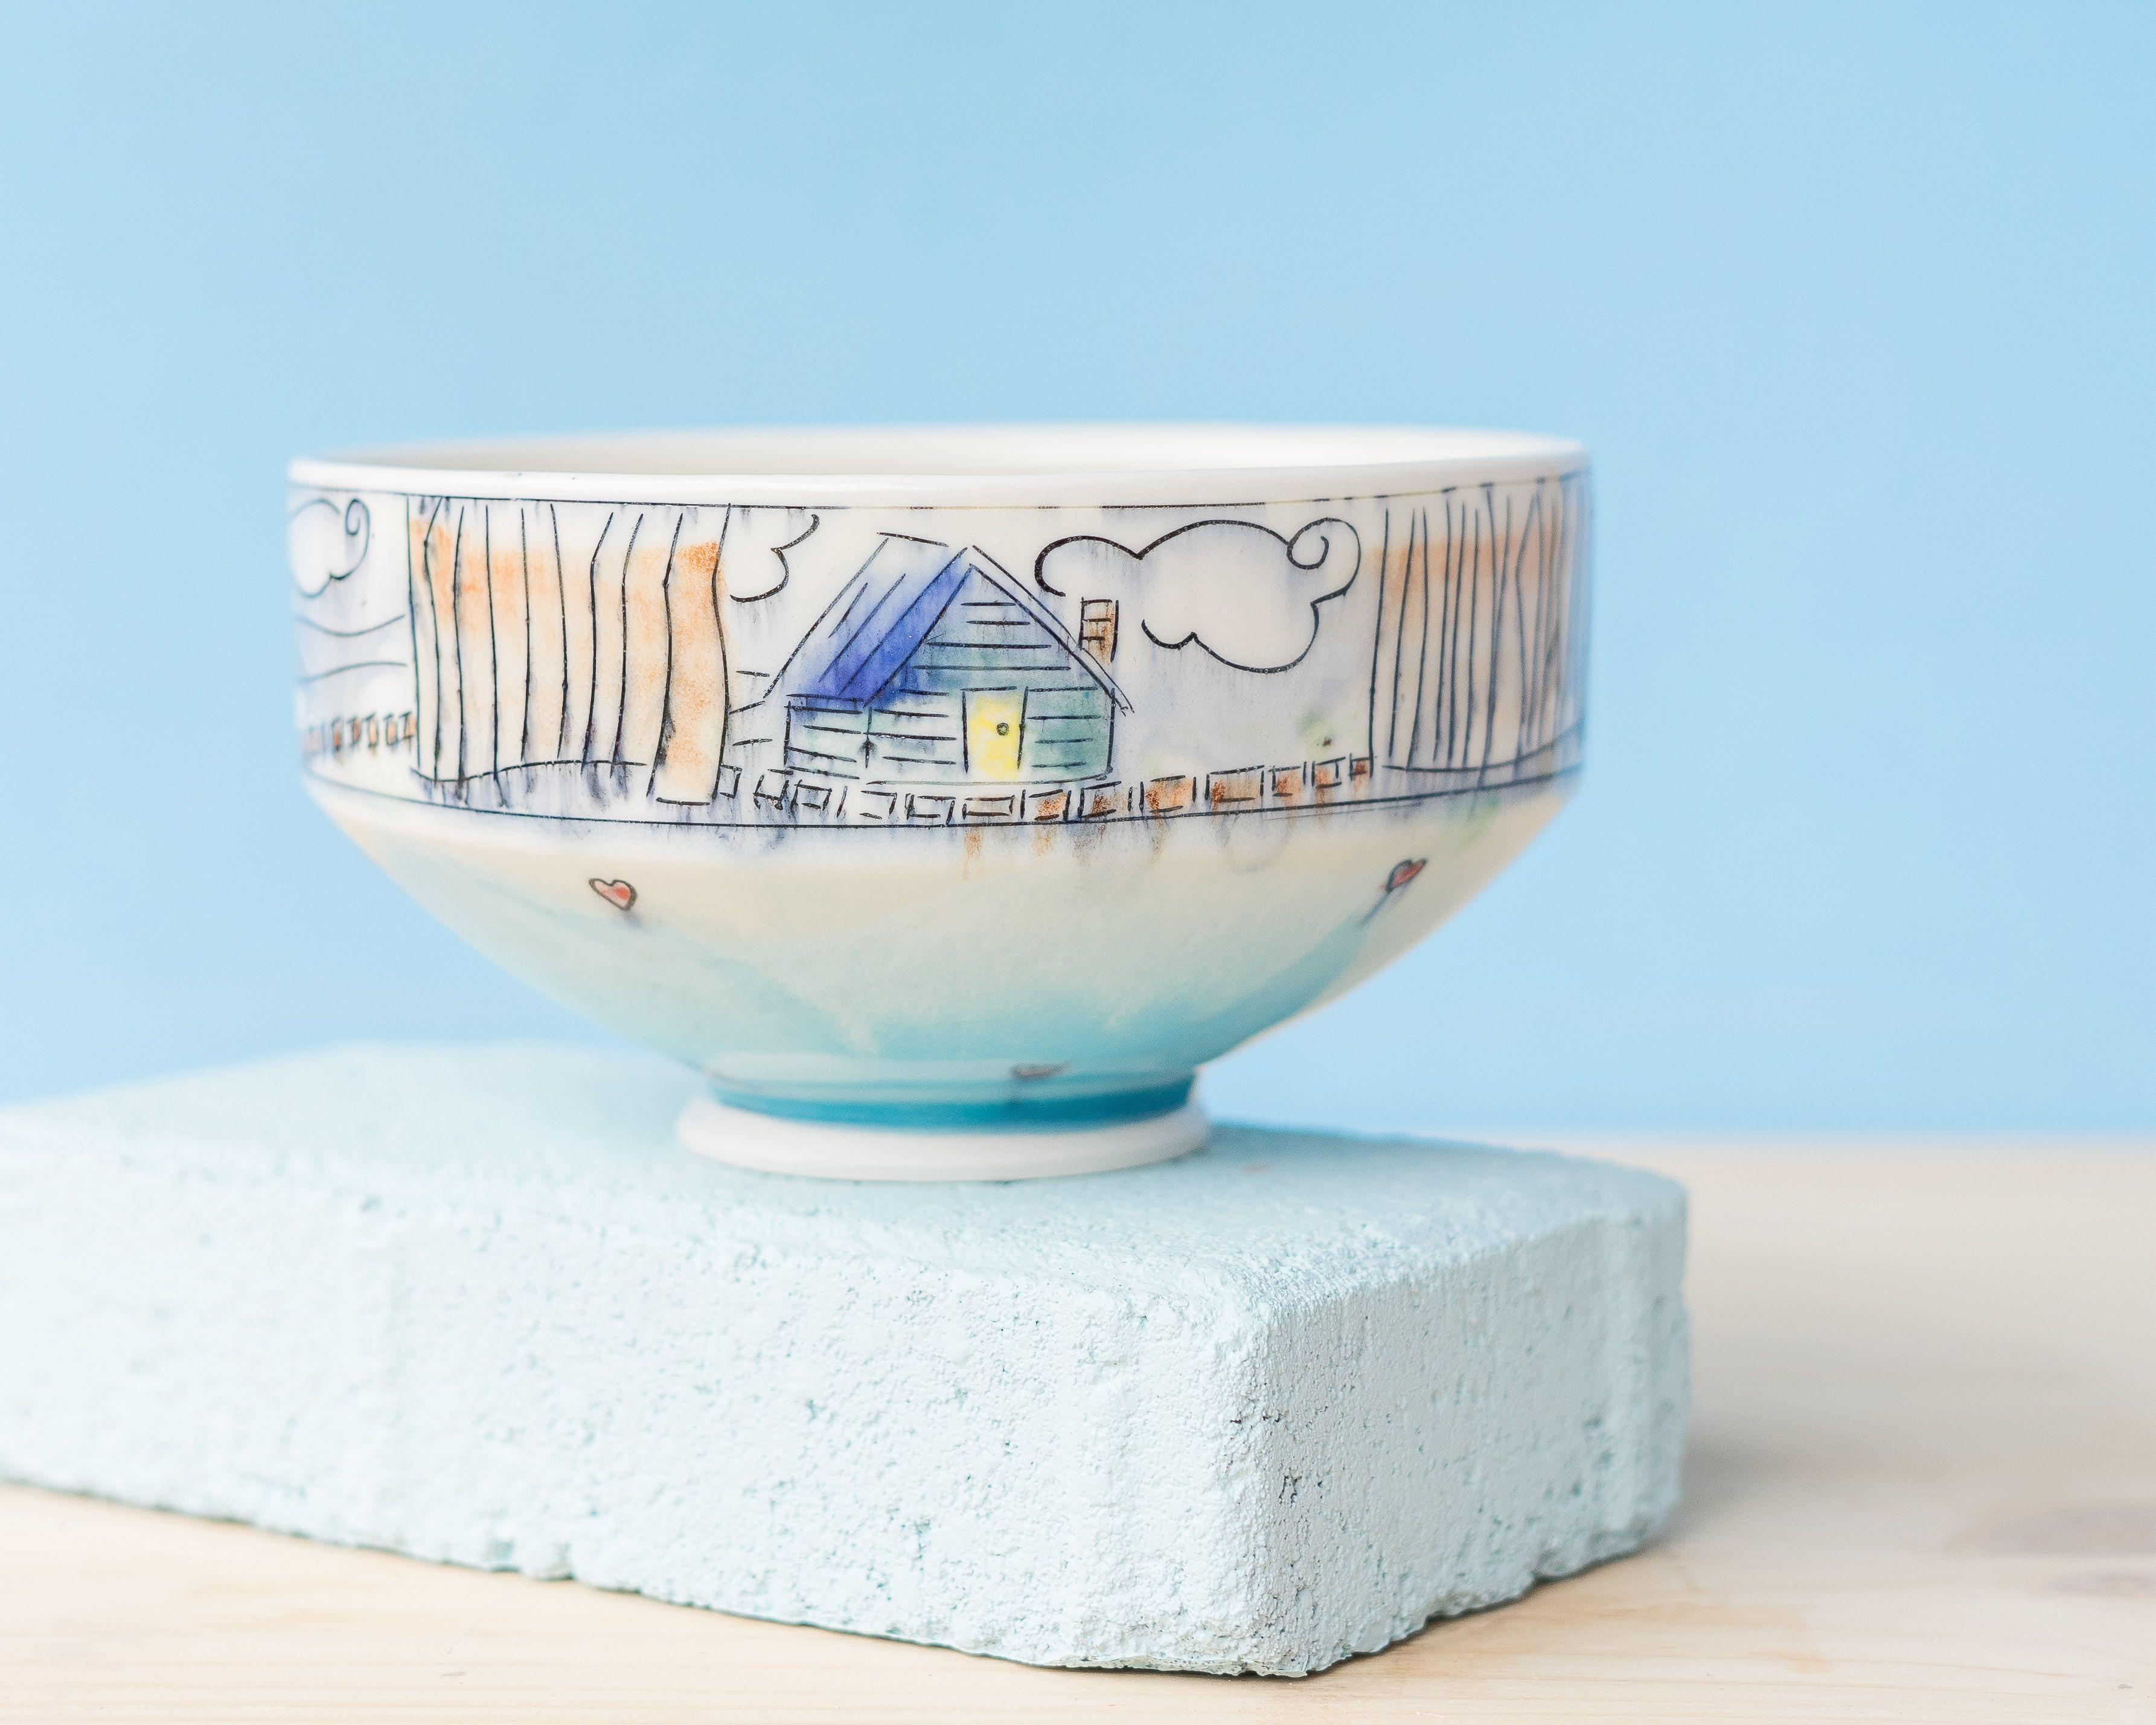 🌟🌸💓 . . . .  #lauriecaffery #handmade #pottery #instapottery #design #mug #handmademug #makersmovement #handsandhustle #potteryvideo #potteryvideos #ashevilleartist #potteryforall #etsy #etsyshop #potterygirl #ceramics #camping #ncmaker